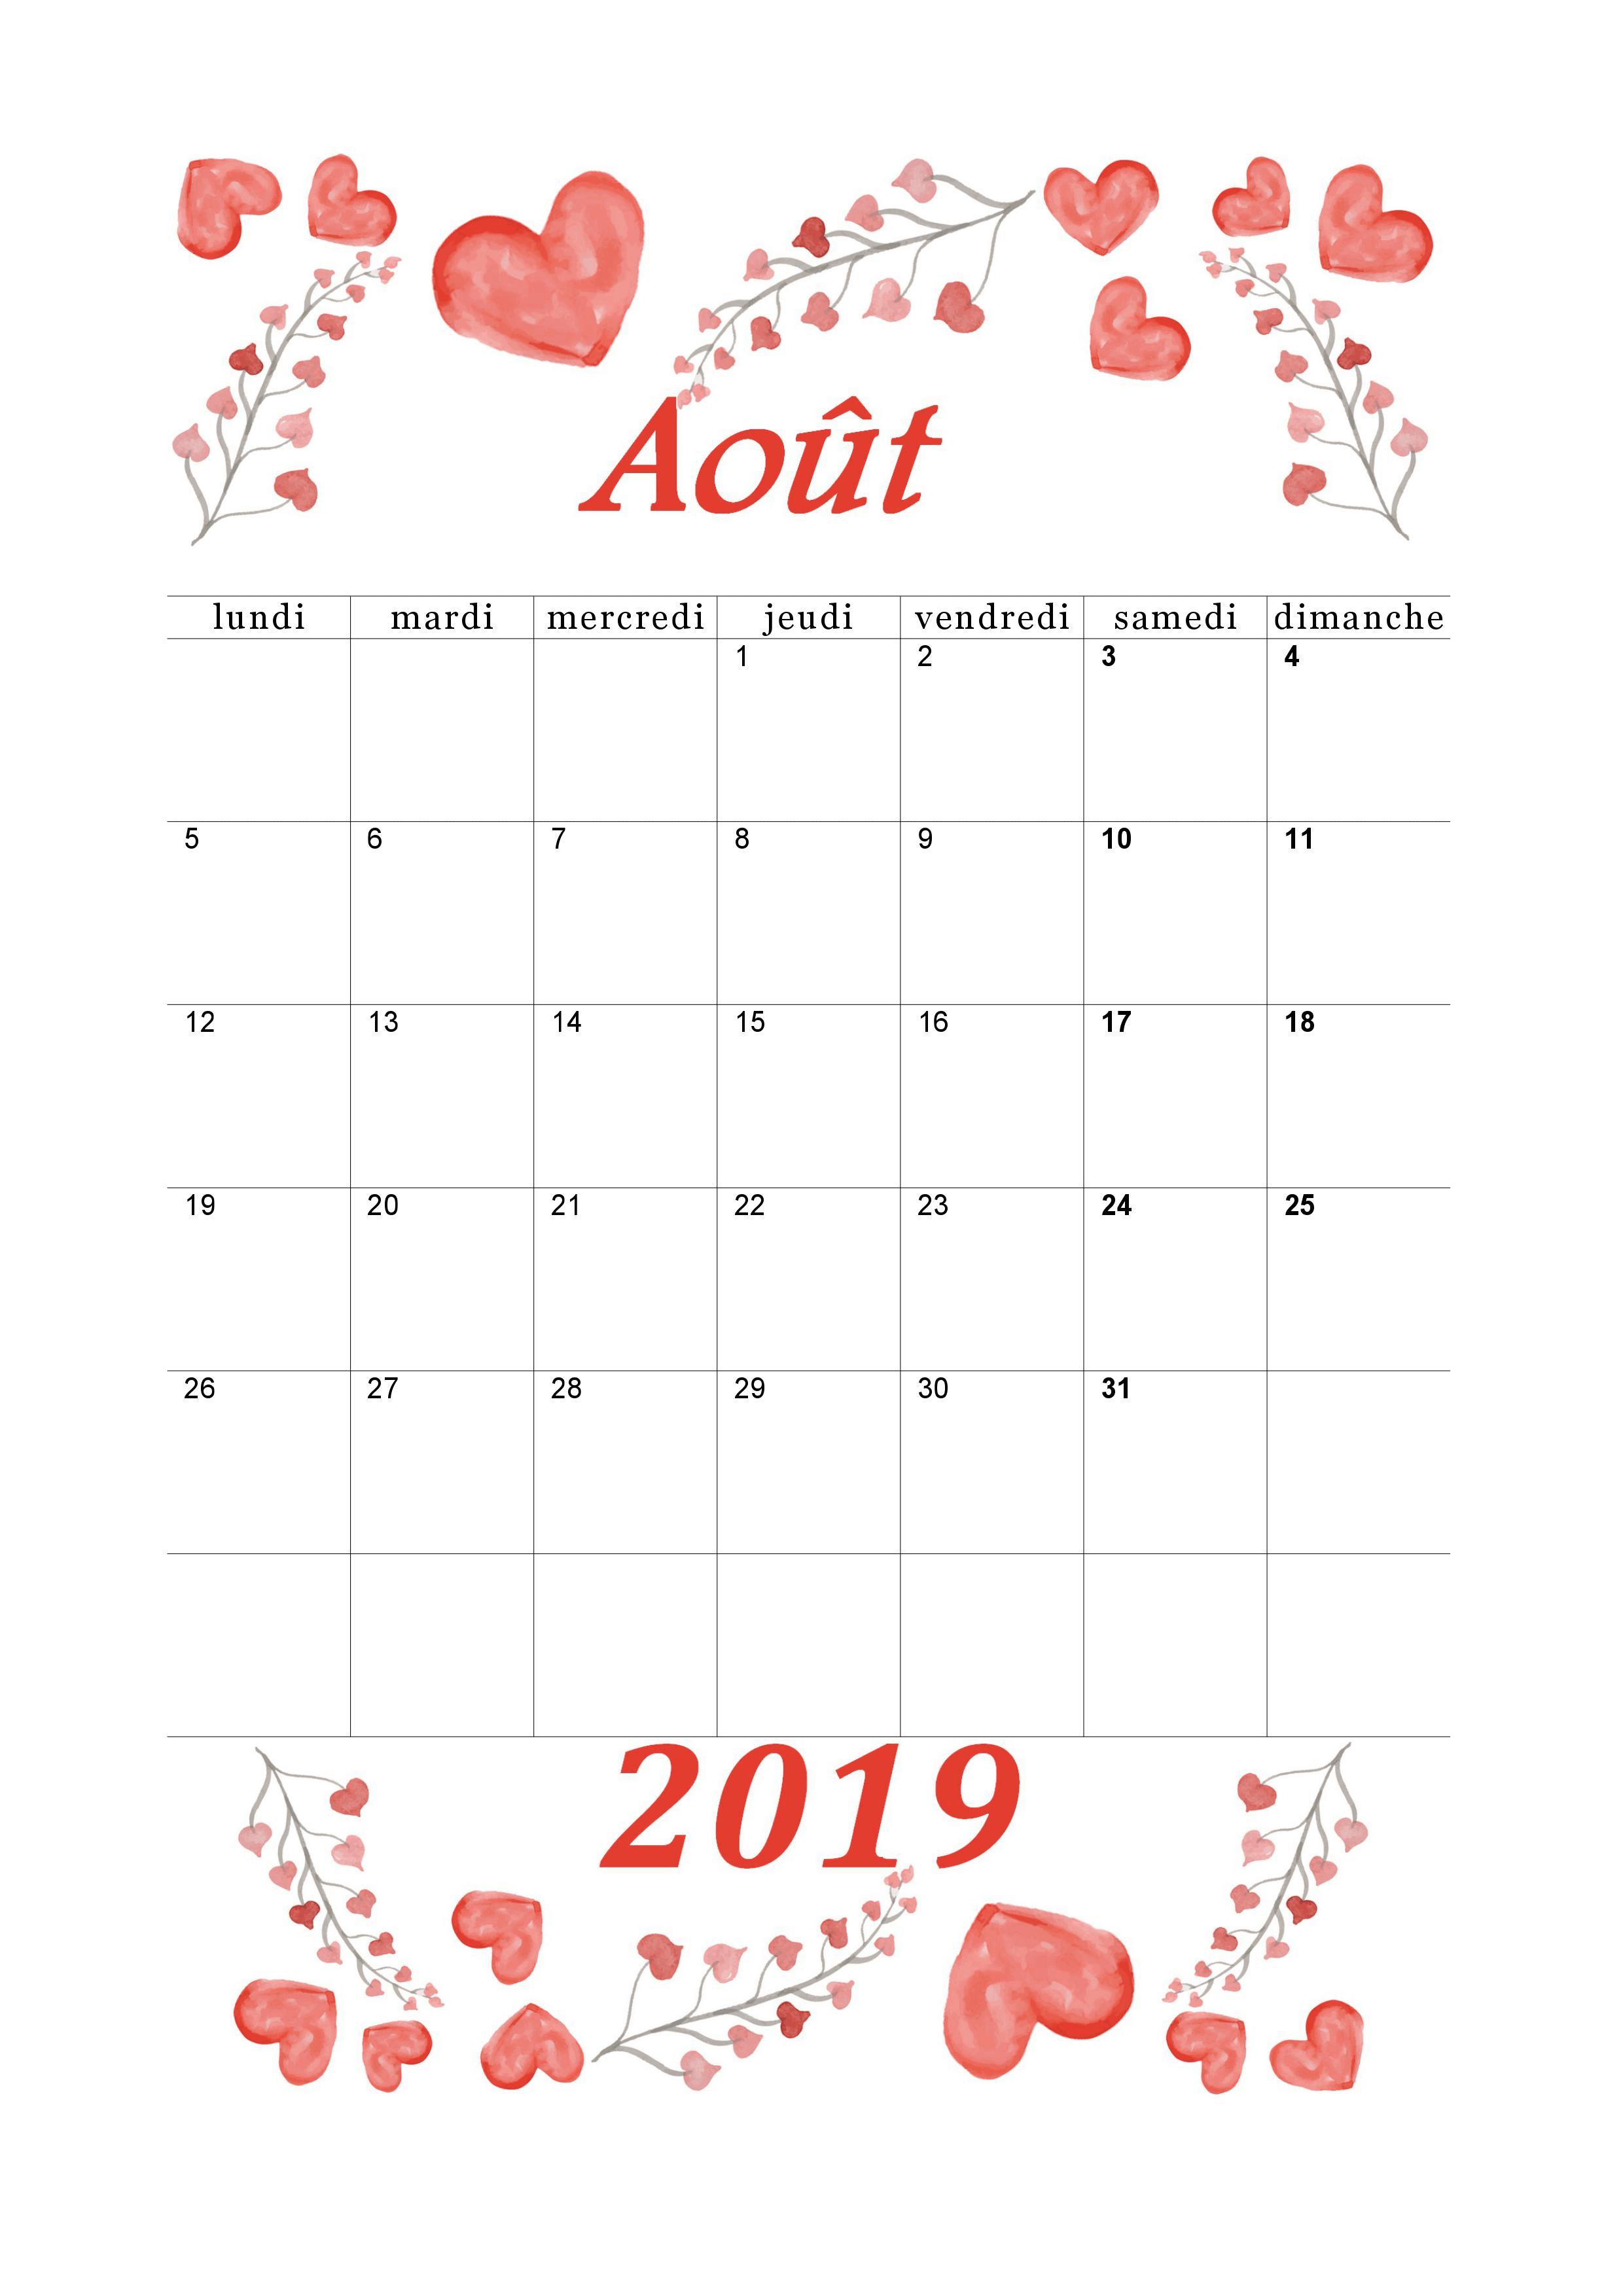 Calendrier 20182019 mensuel à imprimer. Calendrier aout